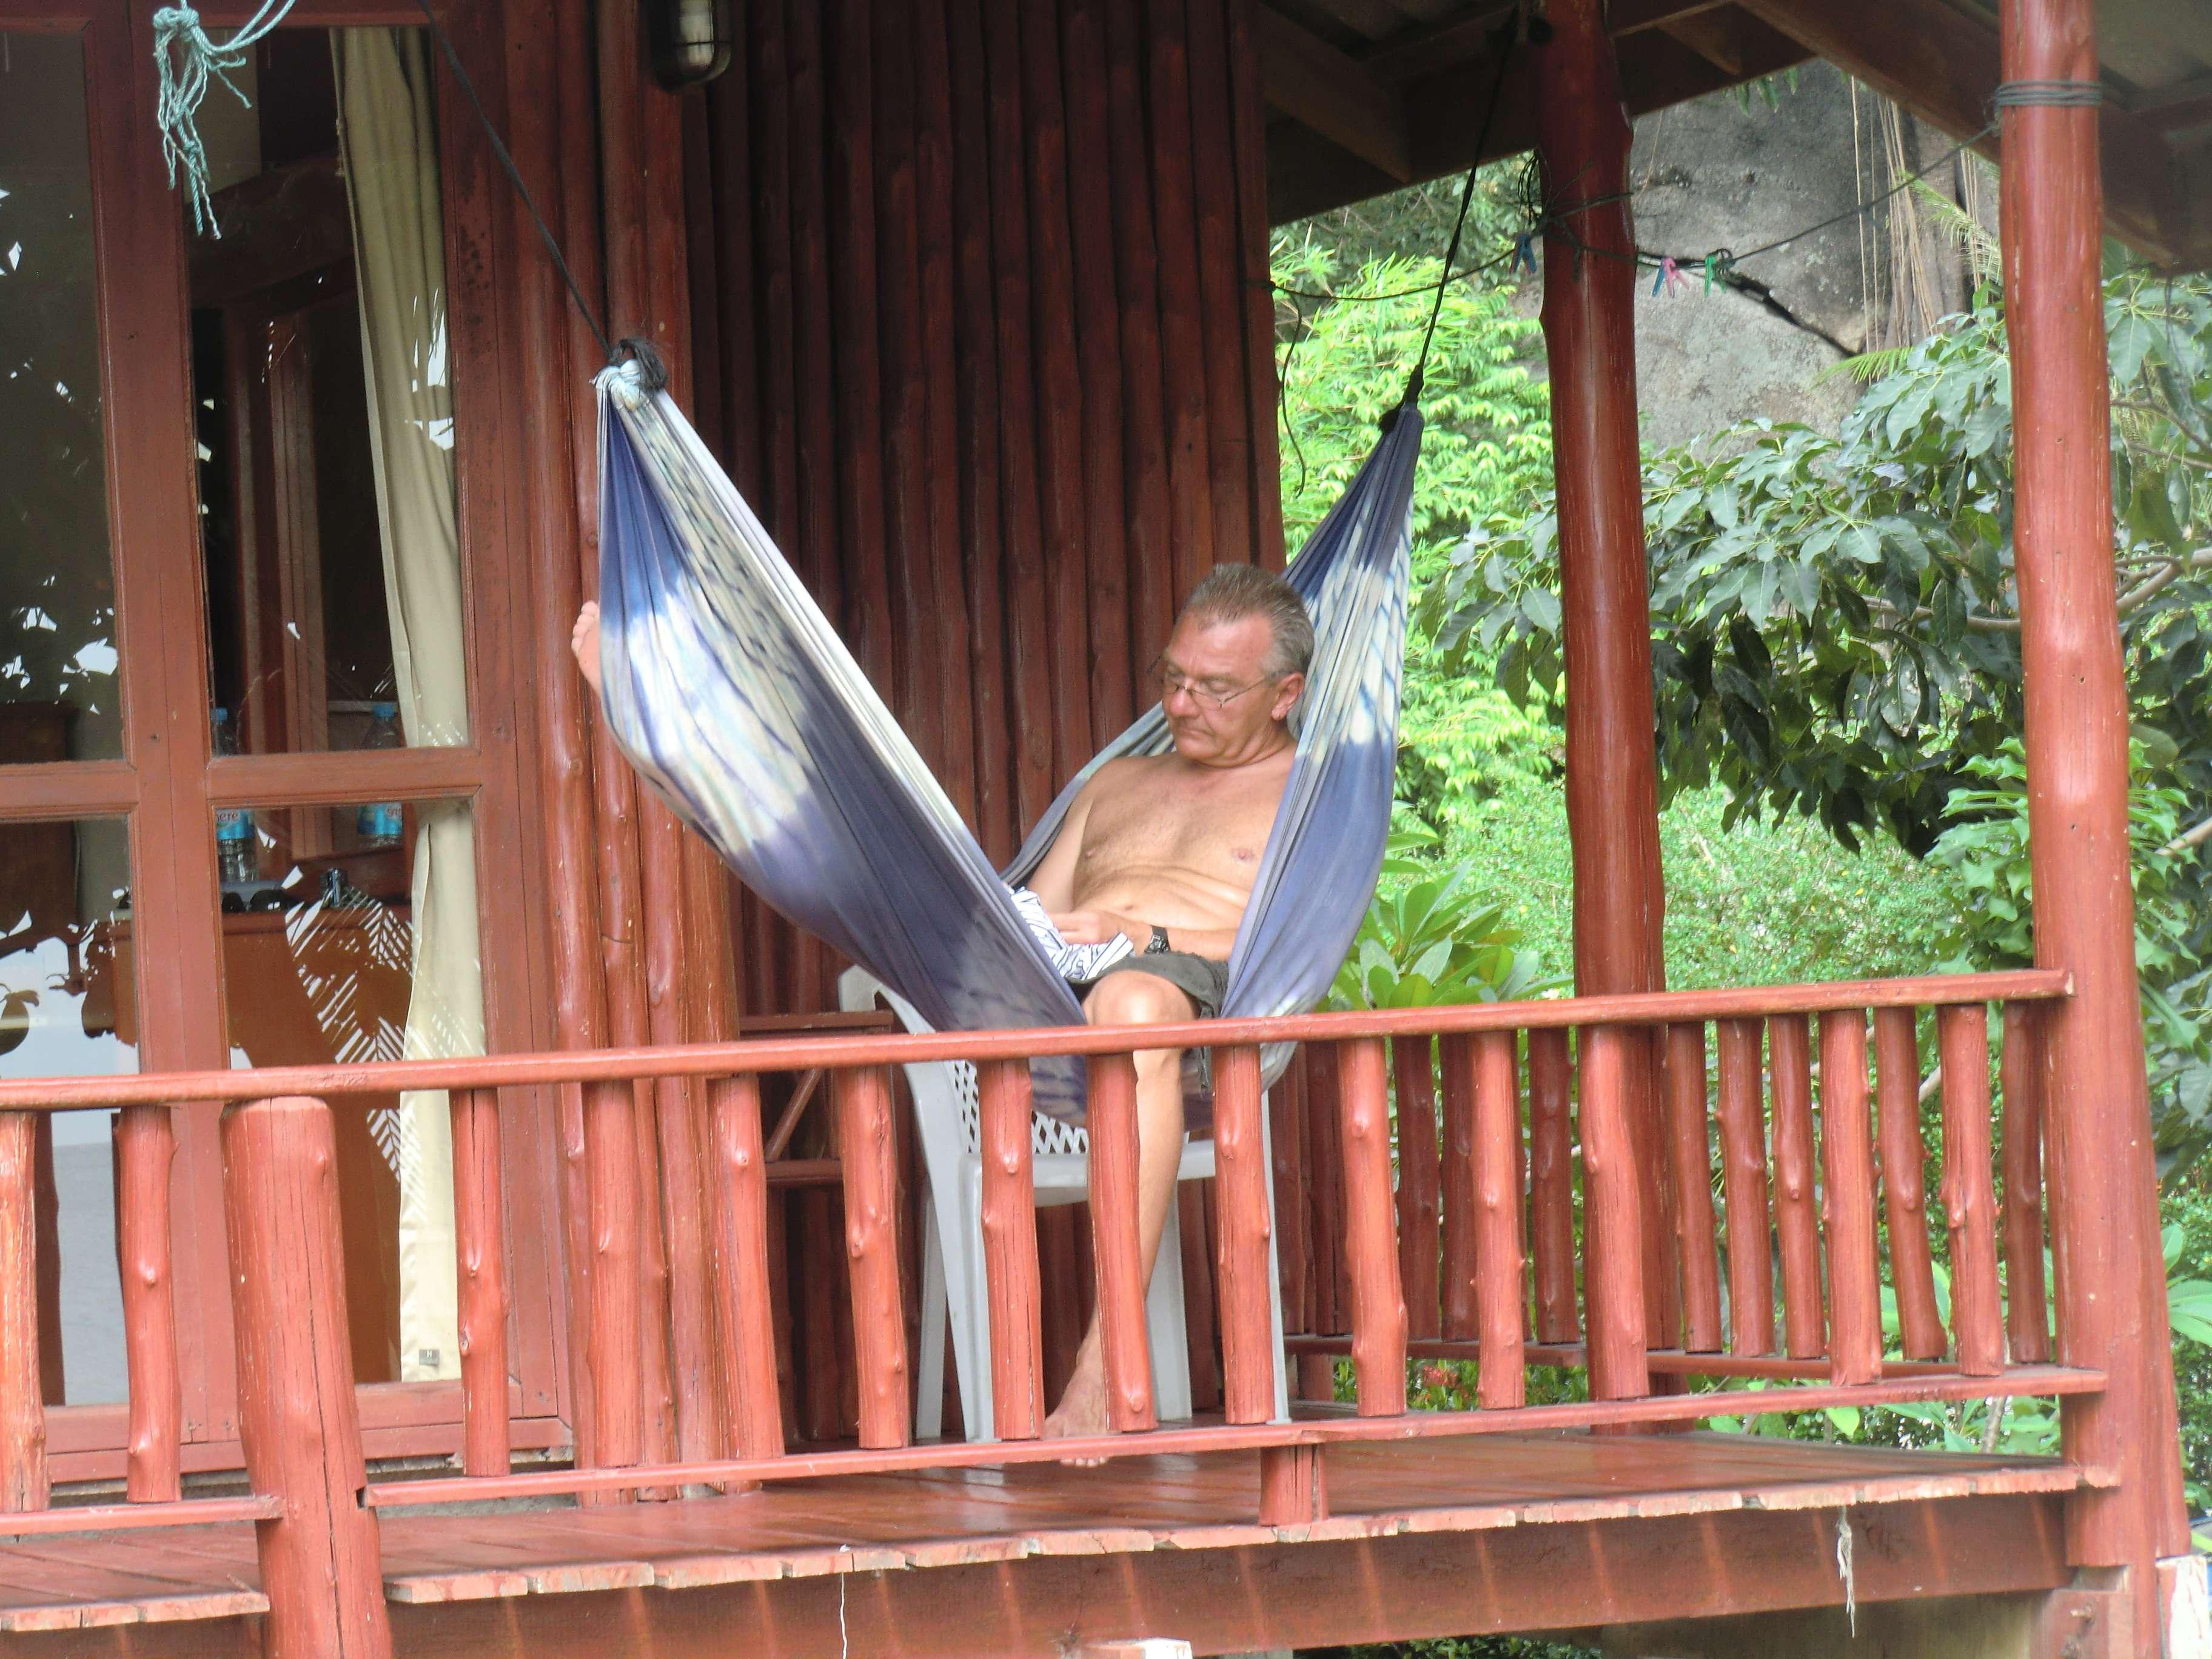 Ralle studiert das kostenlose Phangan-Heft